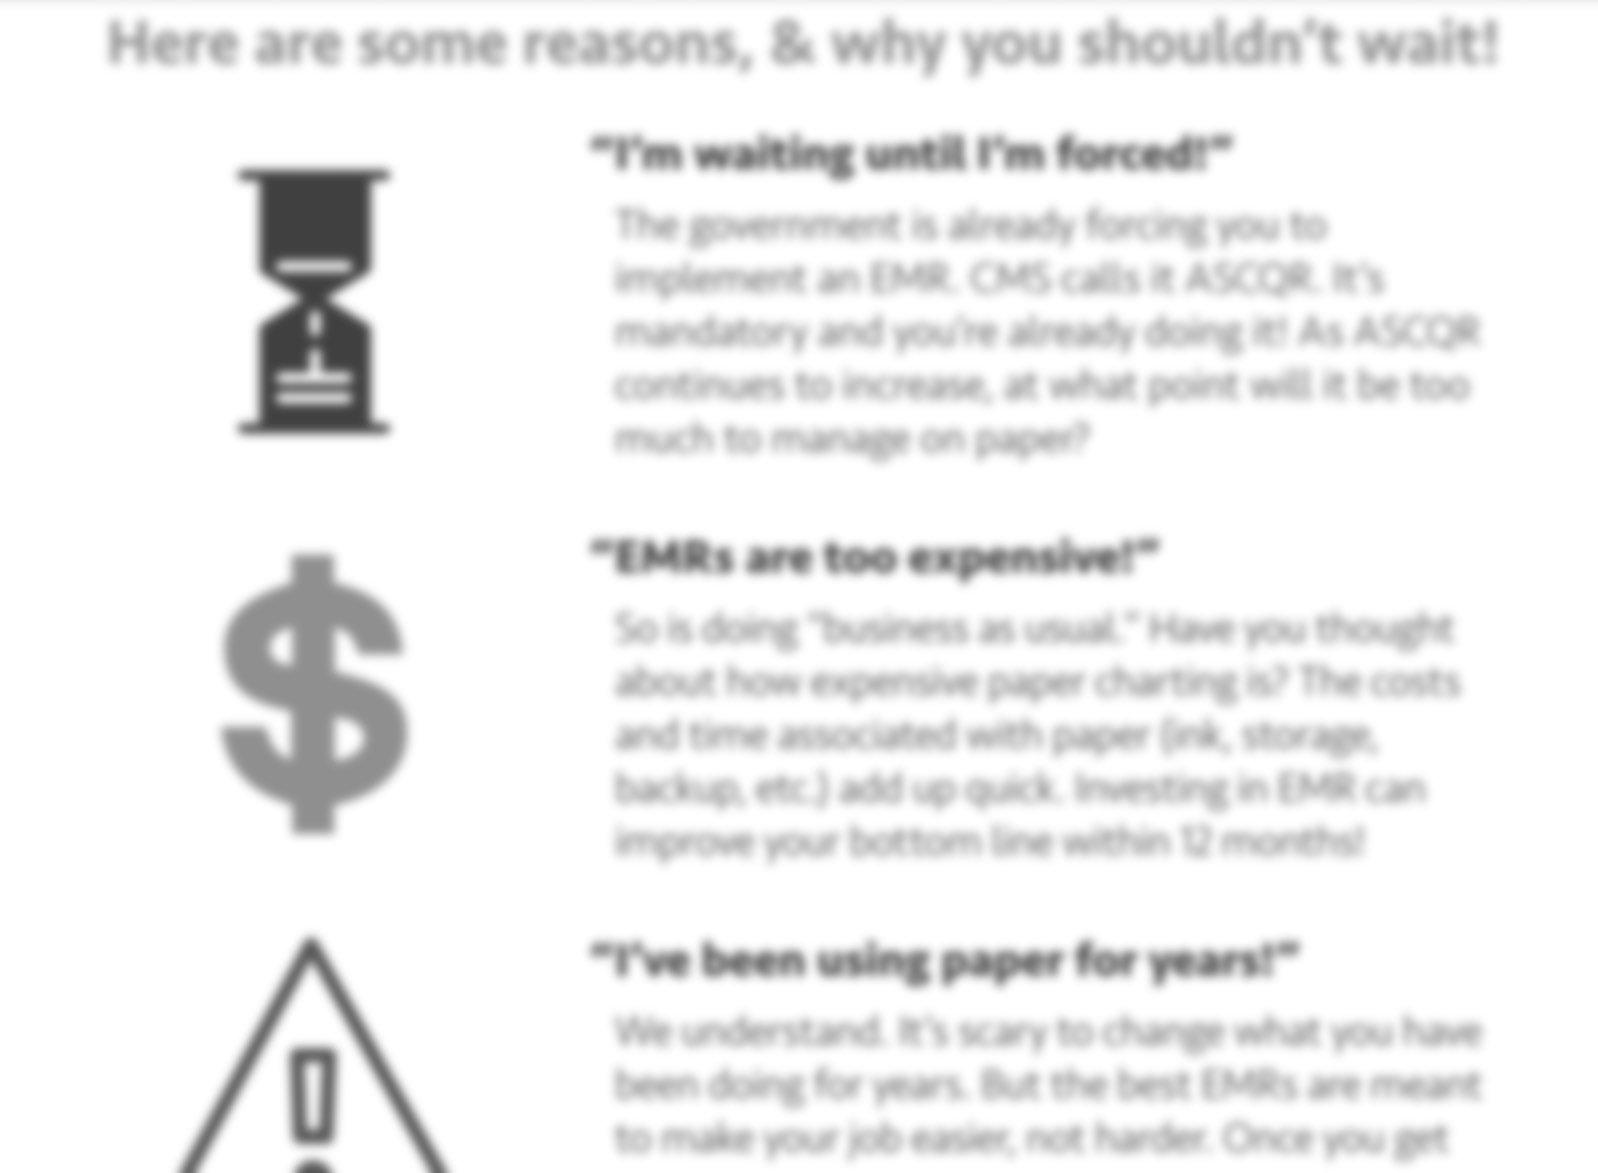 Top 5 Reasons People put off EMRs in ASCs